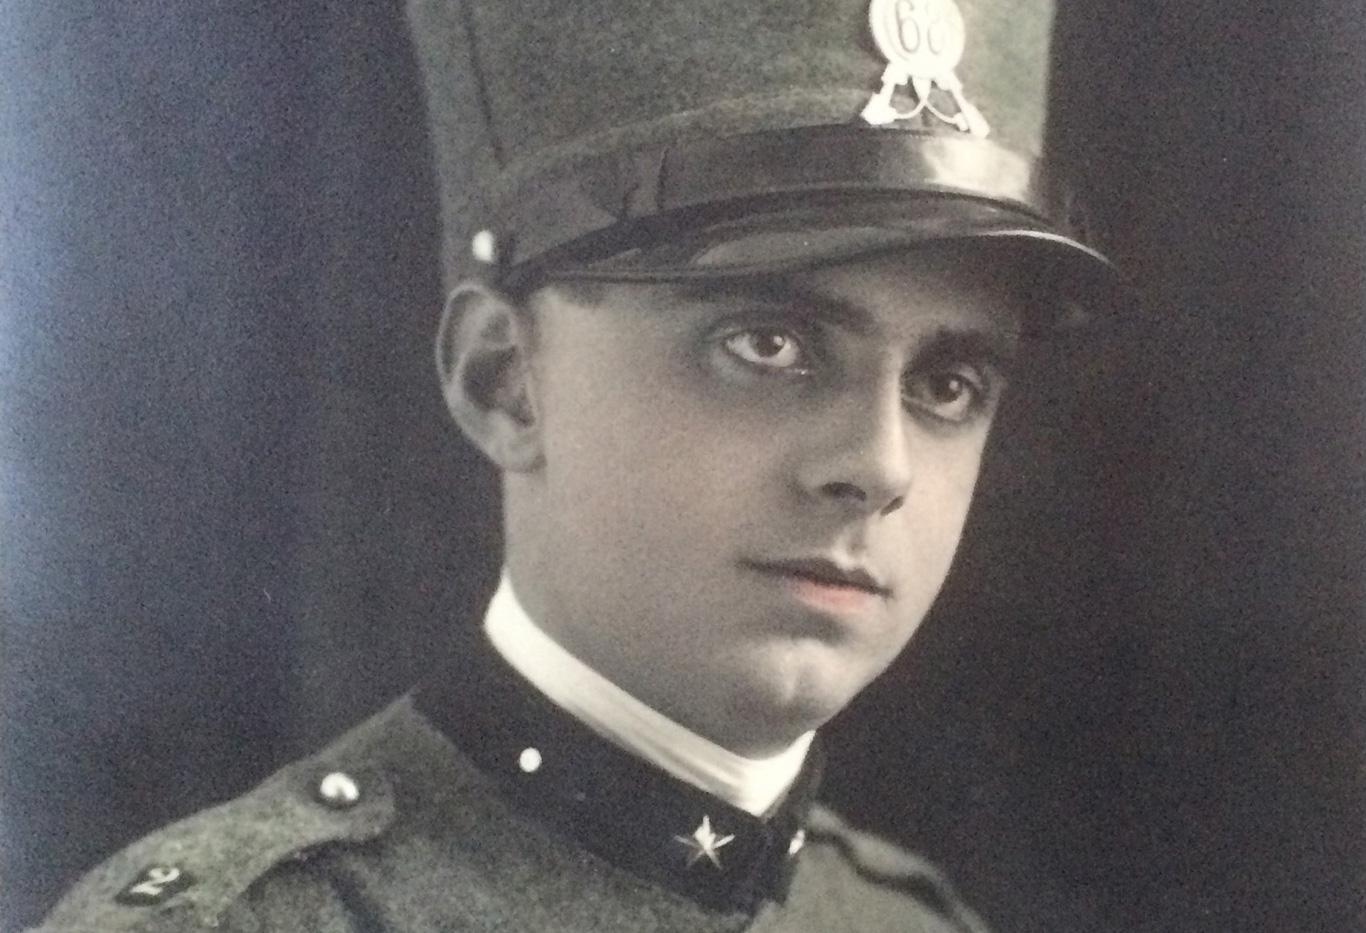 Leandro Ravizzotti